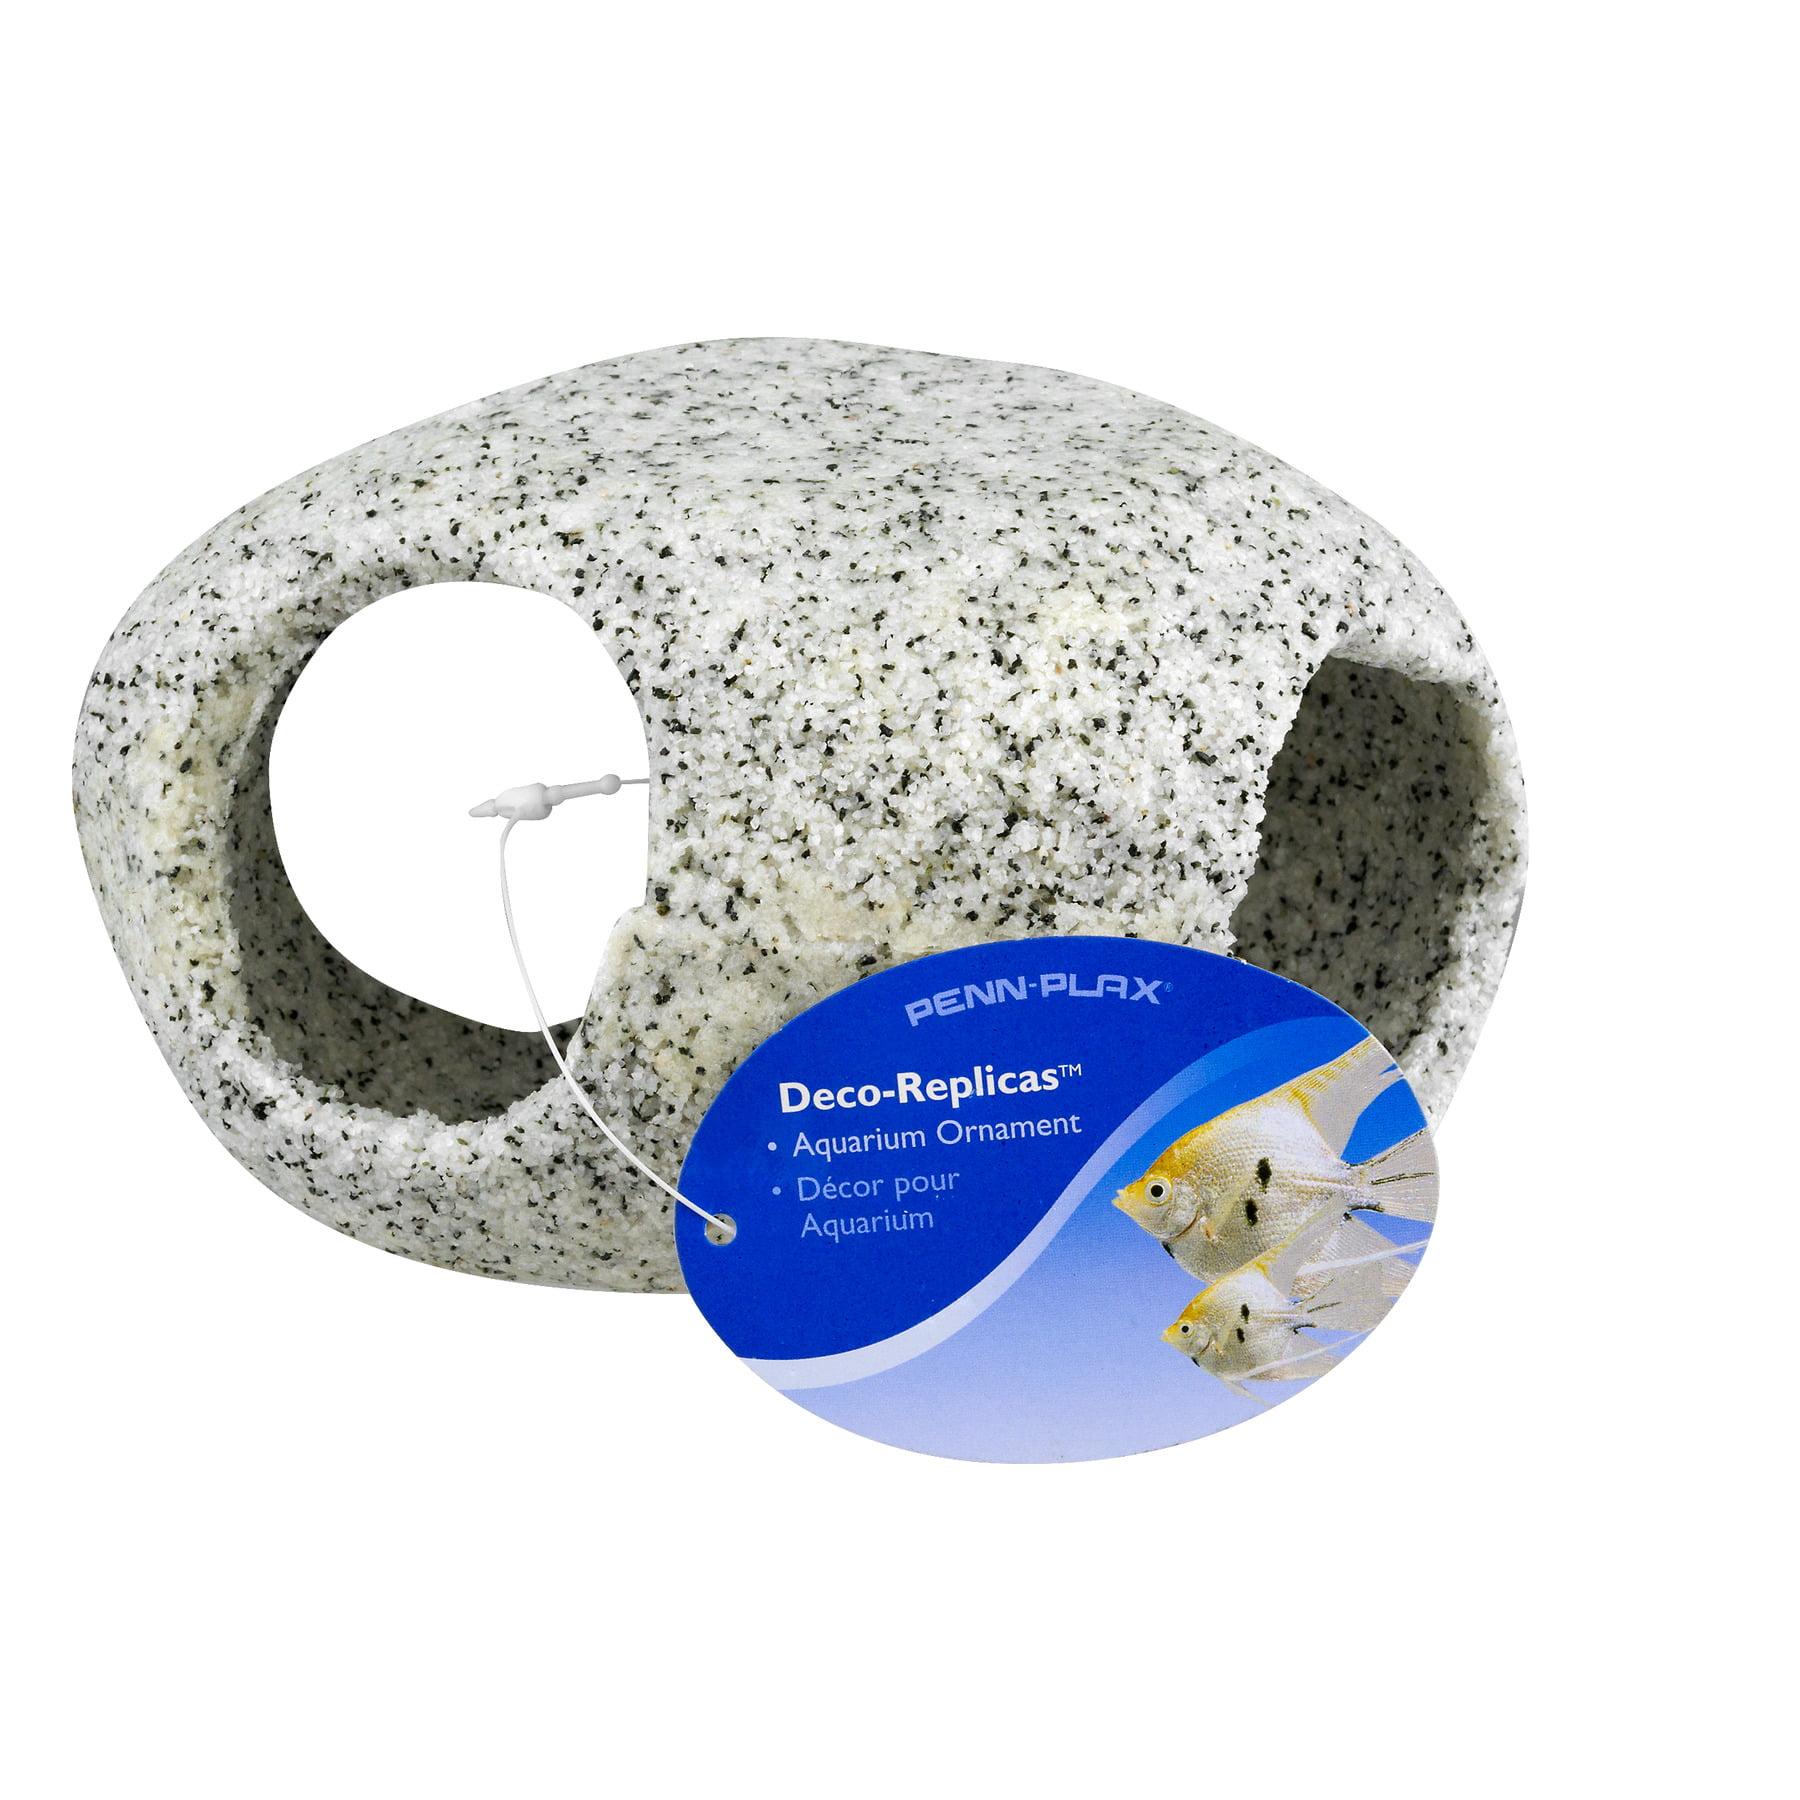 "Penn-Plax Deco-Replicas Aquarium Ornament Round Stone Hideaway Large 4"", 1.0 CT"